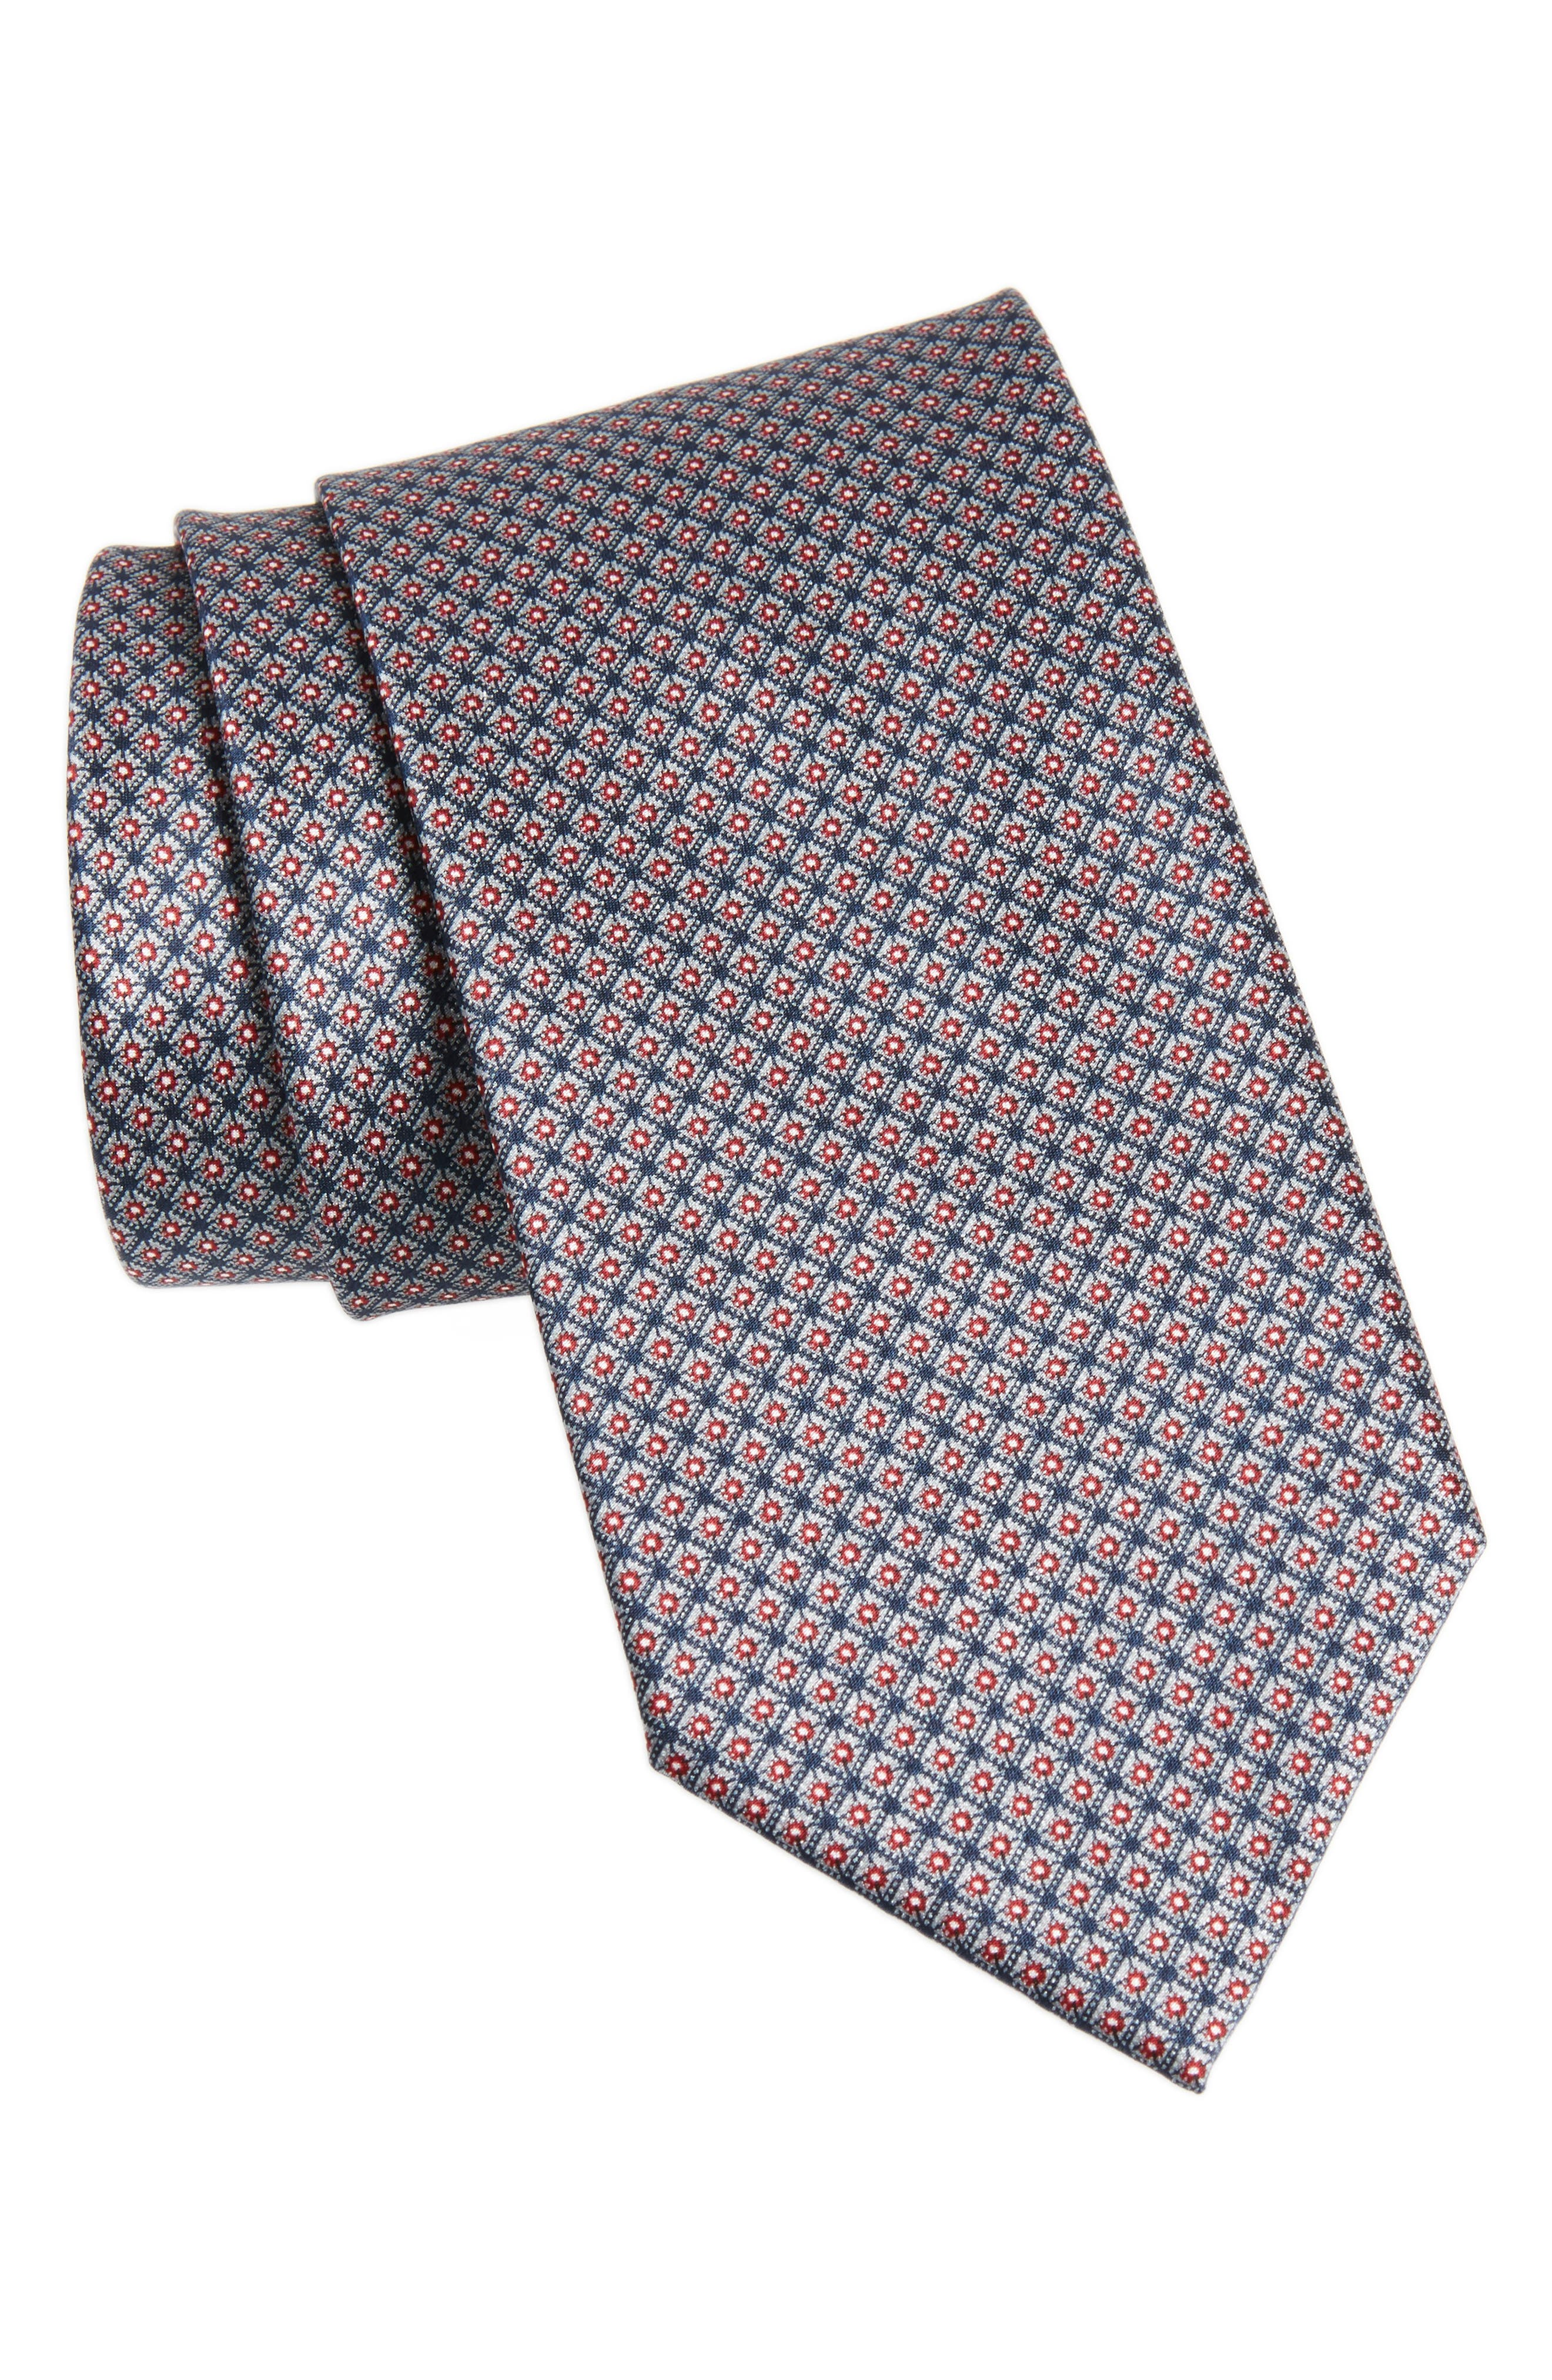 Main Image - Brioni Neat Silk Tie